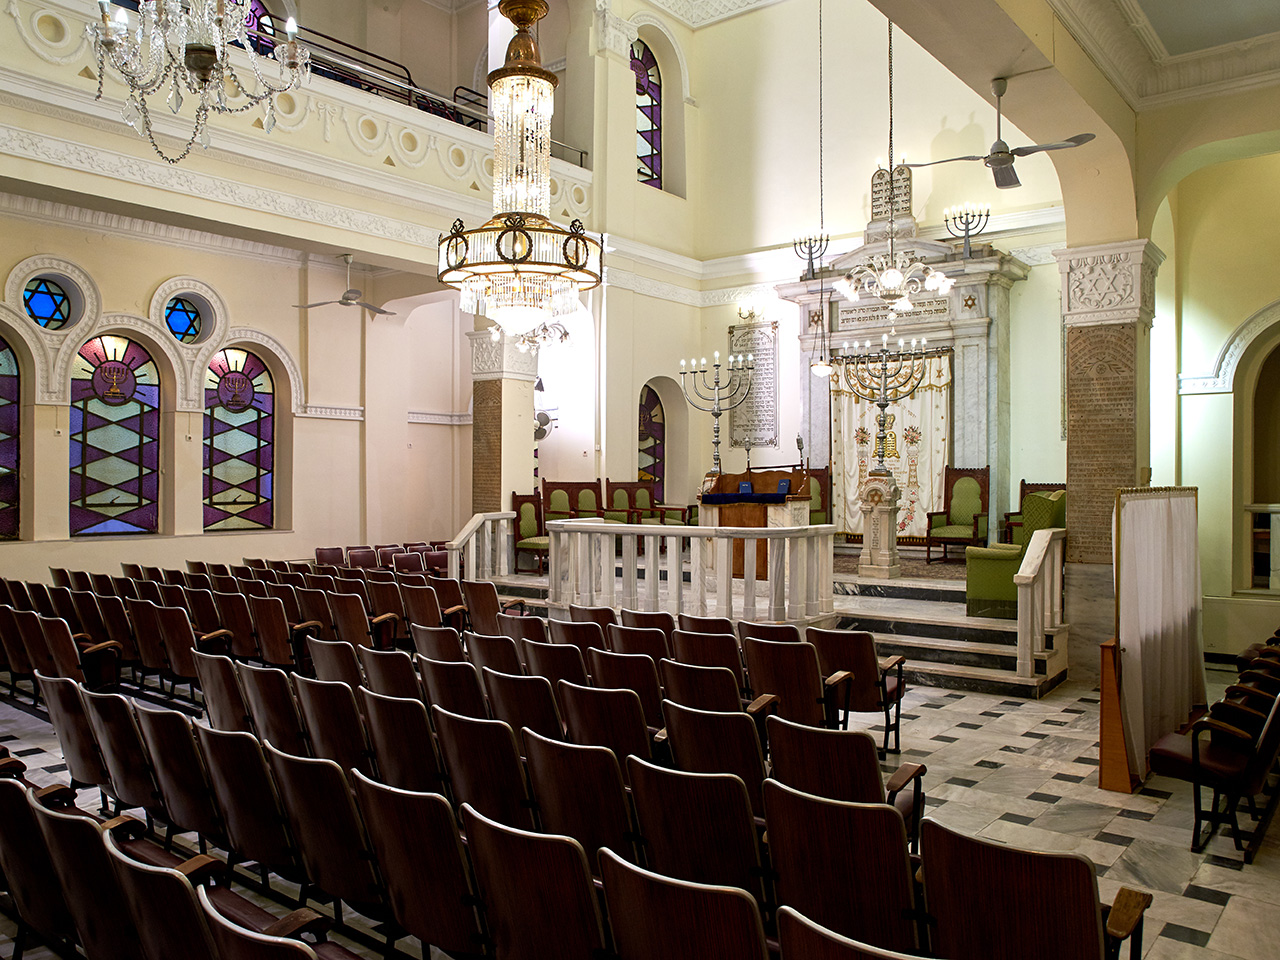 Thessaloniki Monastirioton Synagogue - Greek Jewish tours - Jewish Greek travel packages in Greece - Thessaloniki Jewish tour - Jewish tour of Thessaloniki Greece - Atlantis Travel Agency in Greece